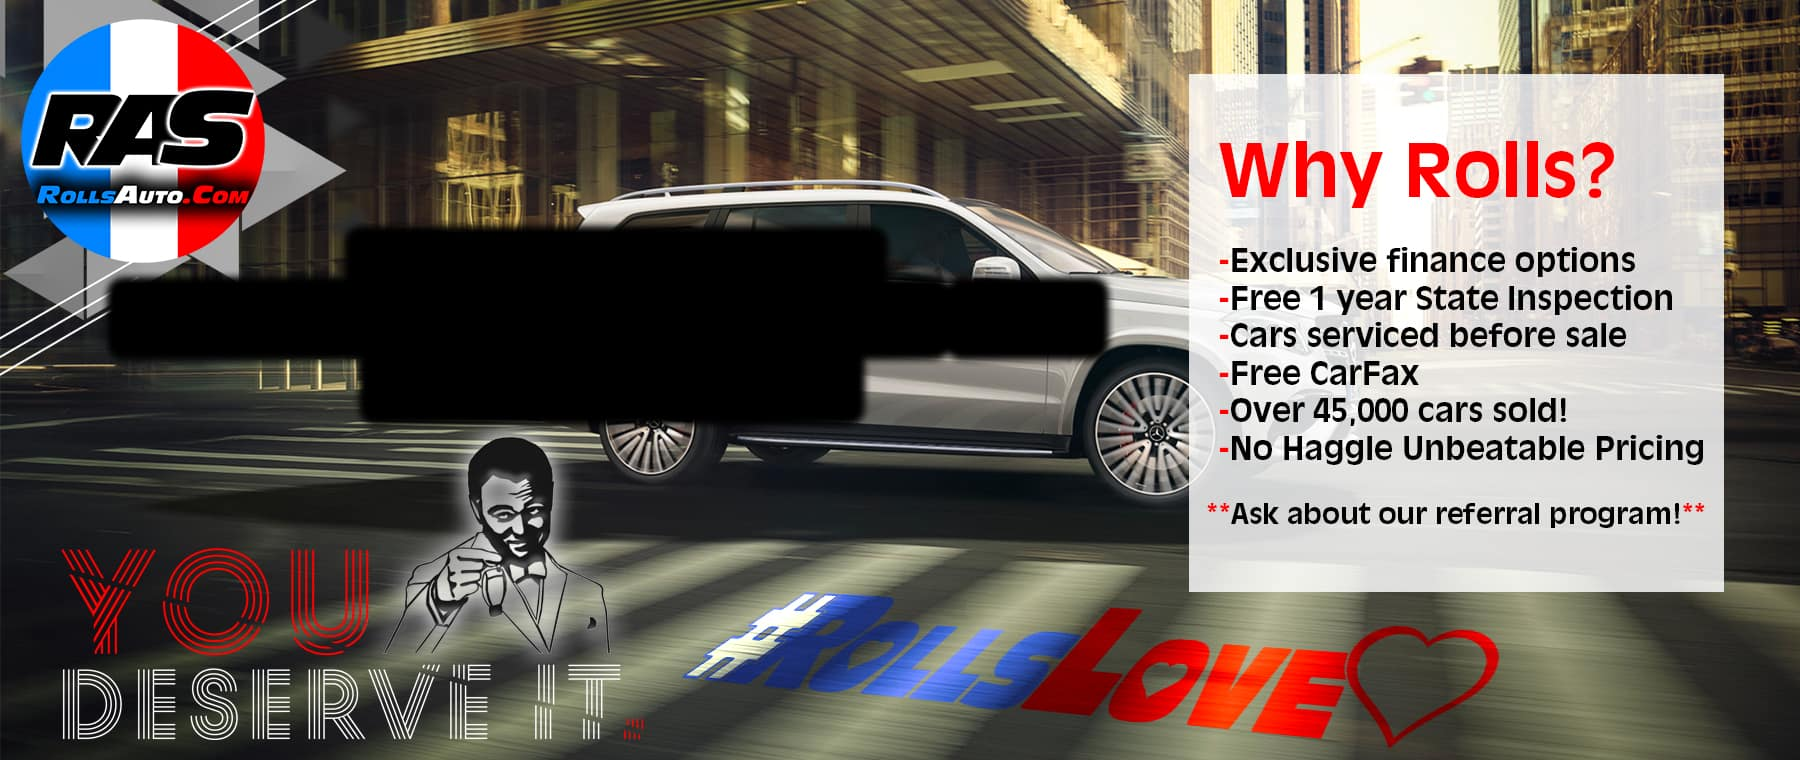 Used Cars In Philadelphia >> Rolls Auto Sales Used Car Dealership In Philadelphia Pa